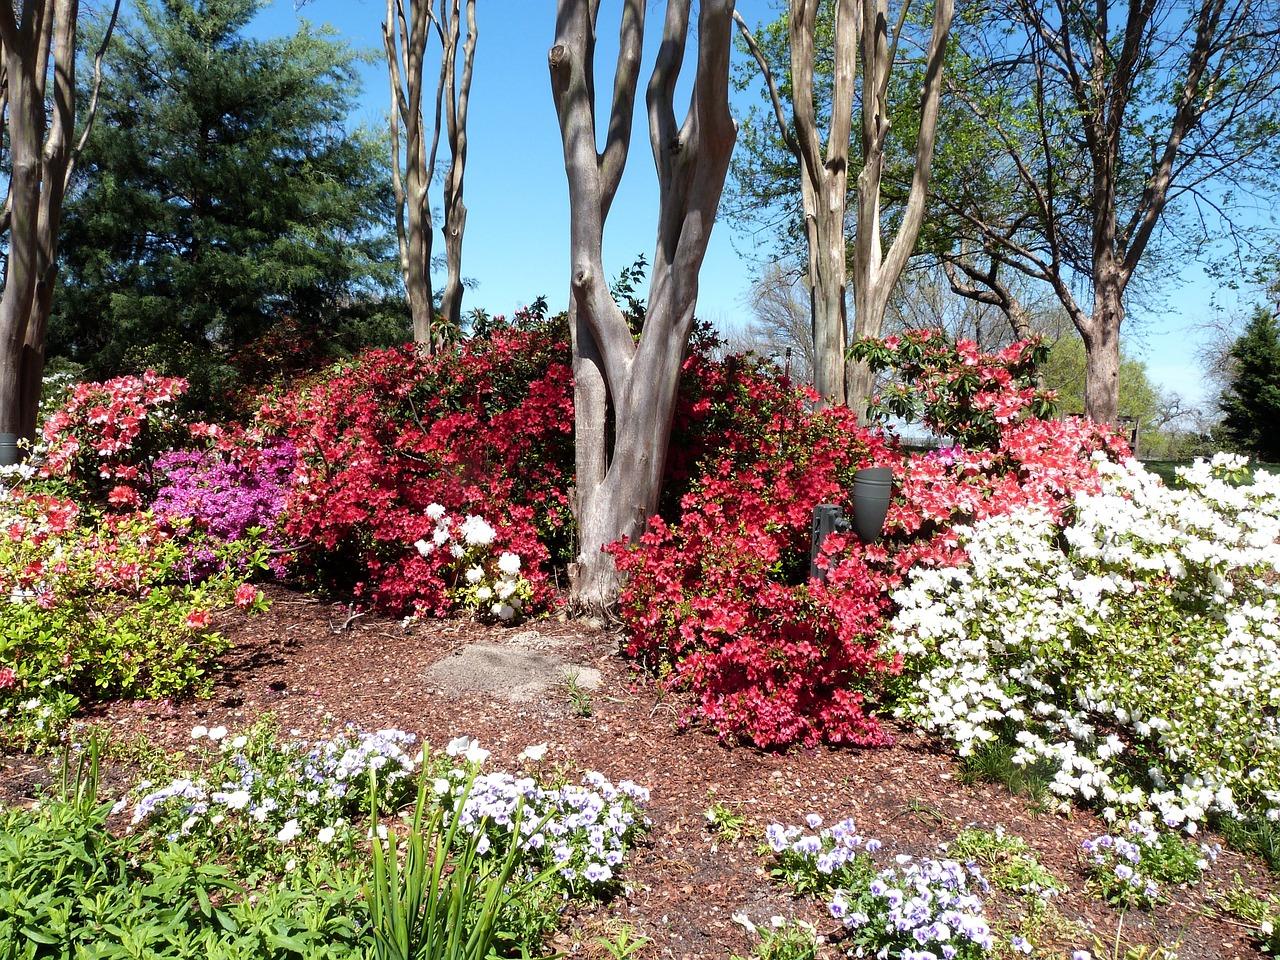 azaleas in bloom on a Dallas Arboretum and Botanical Garden day trip